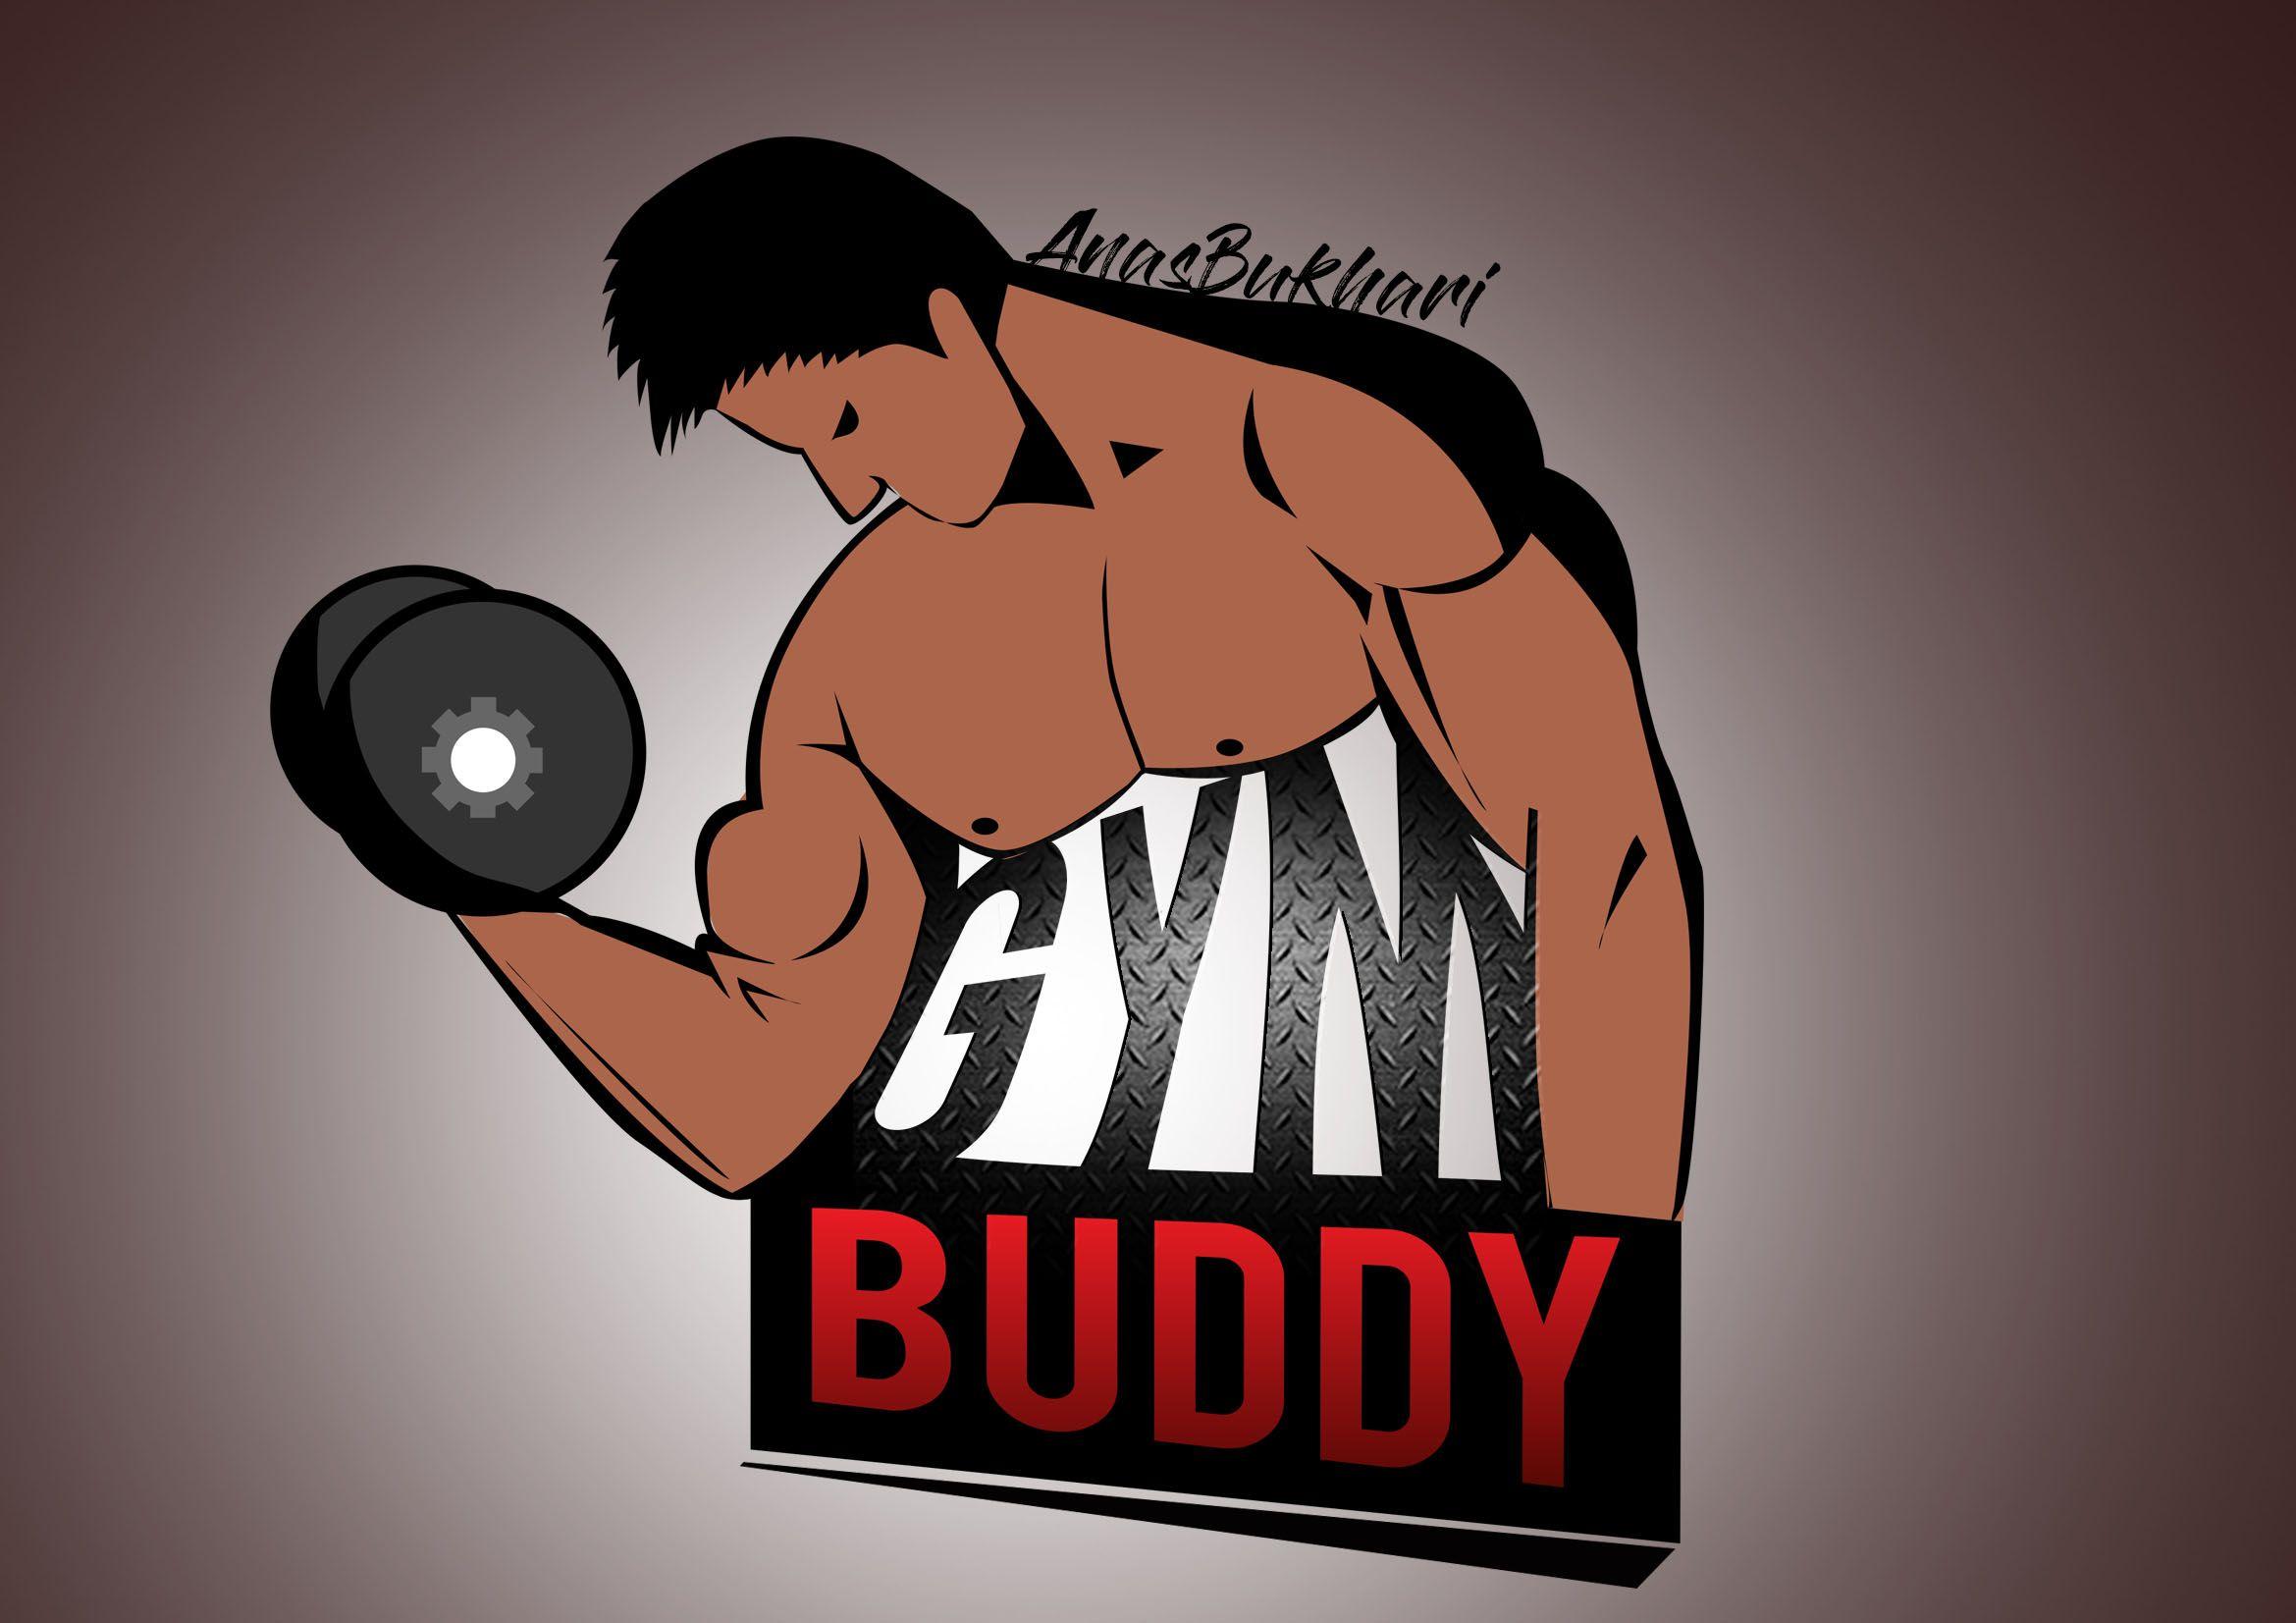 GYM buddy  logo  Pinterest  Gym buddy